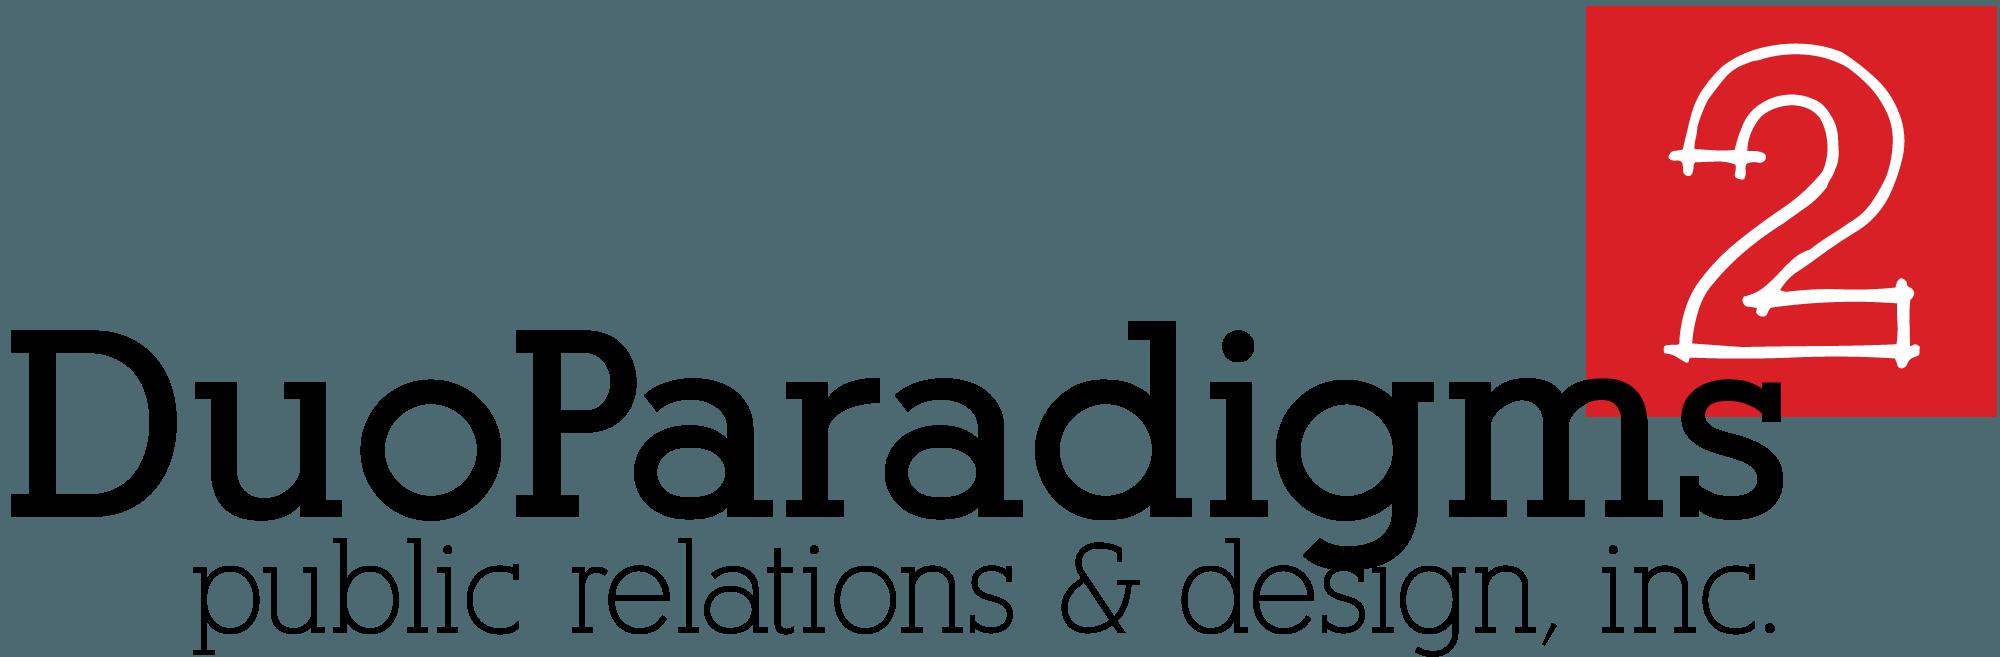 DuoParadigms logo